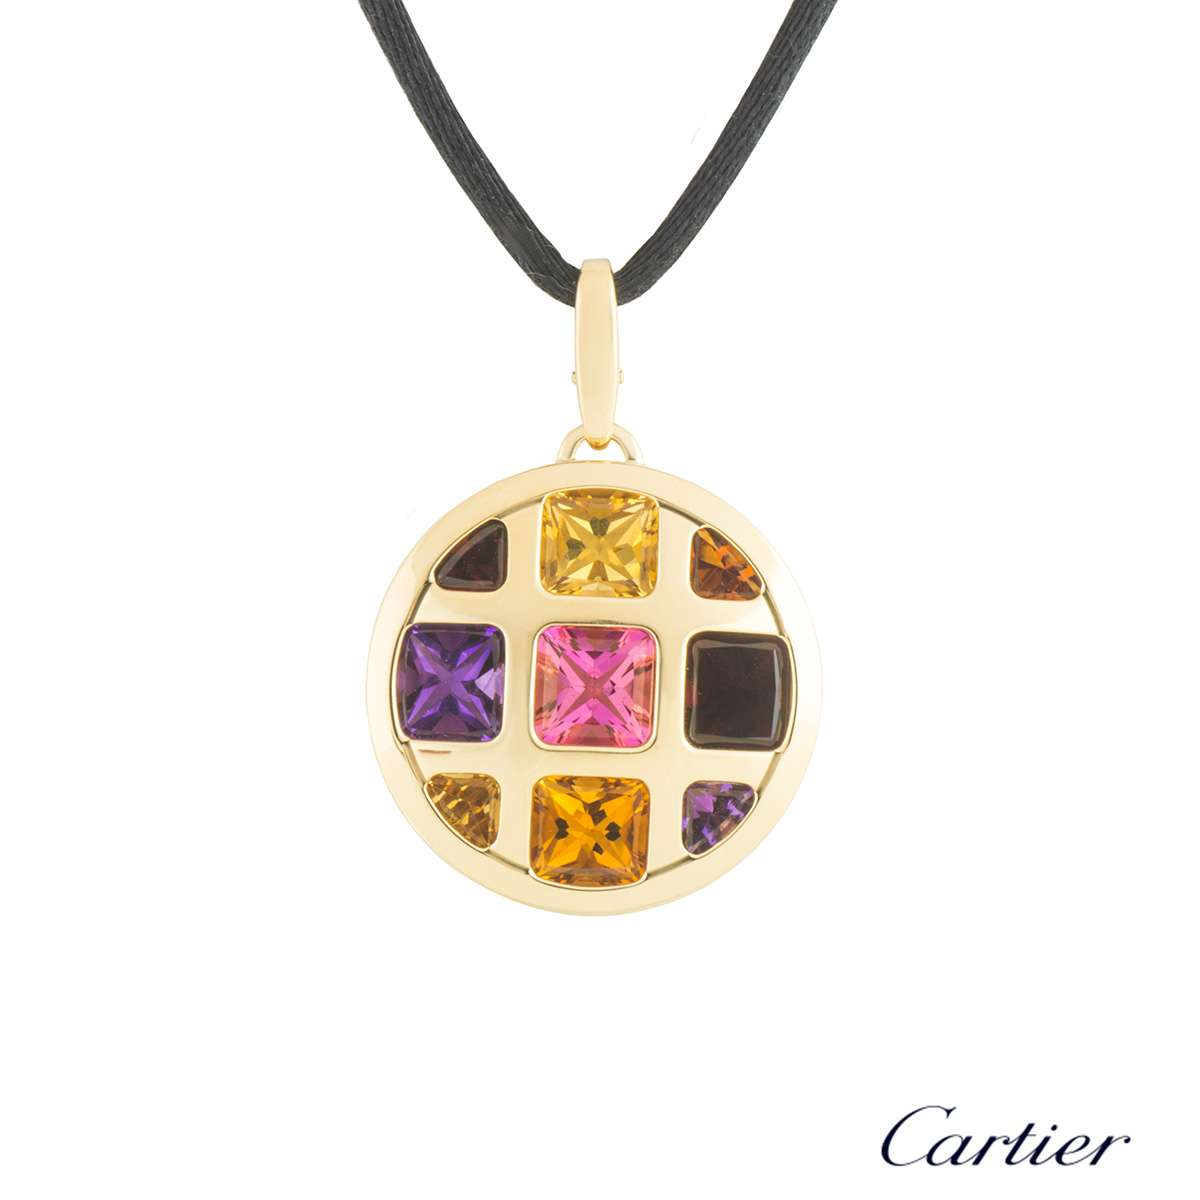 CartierYellow Gold Multi-GemstonePasha PendantB3020200